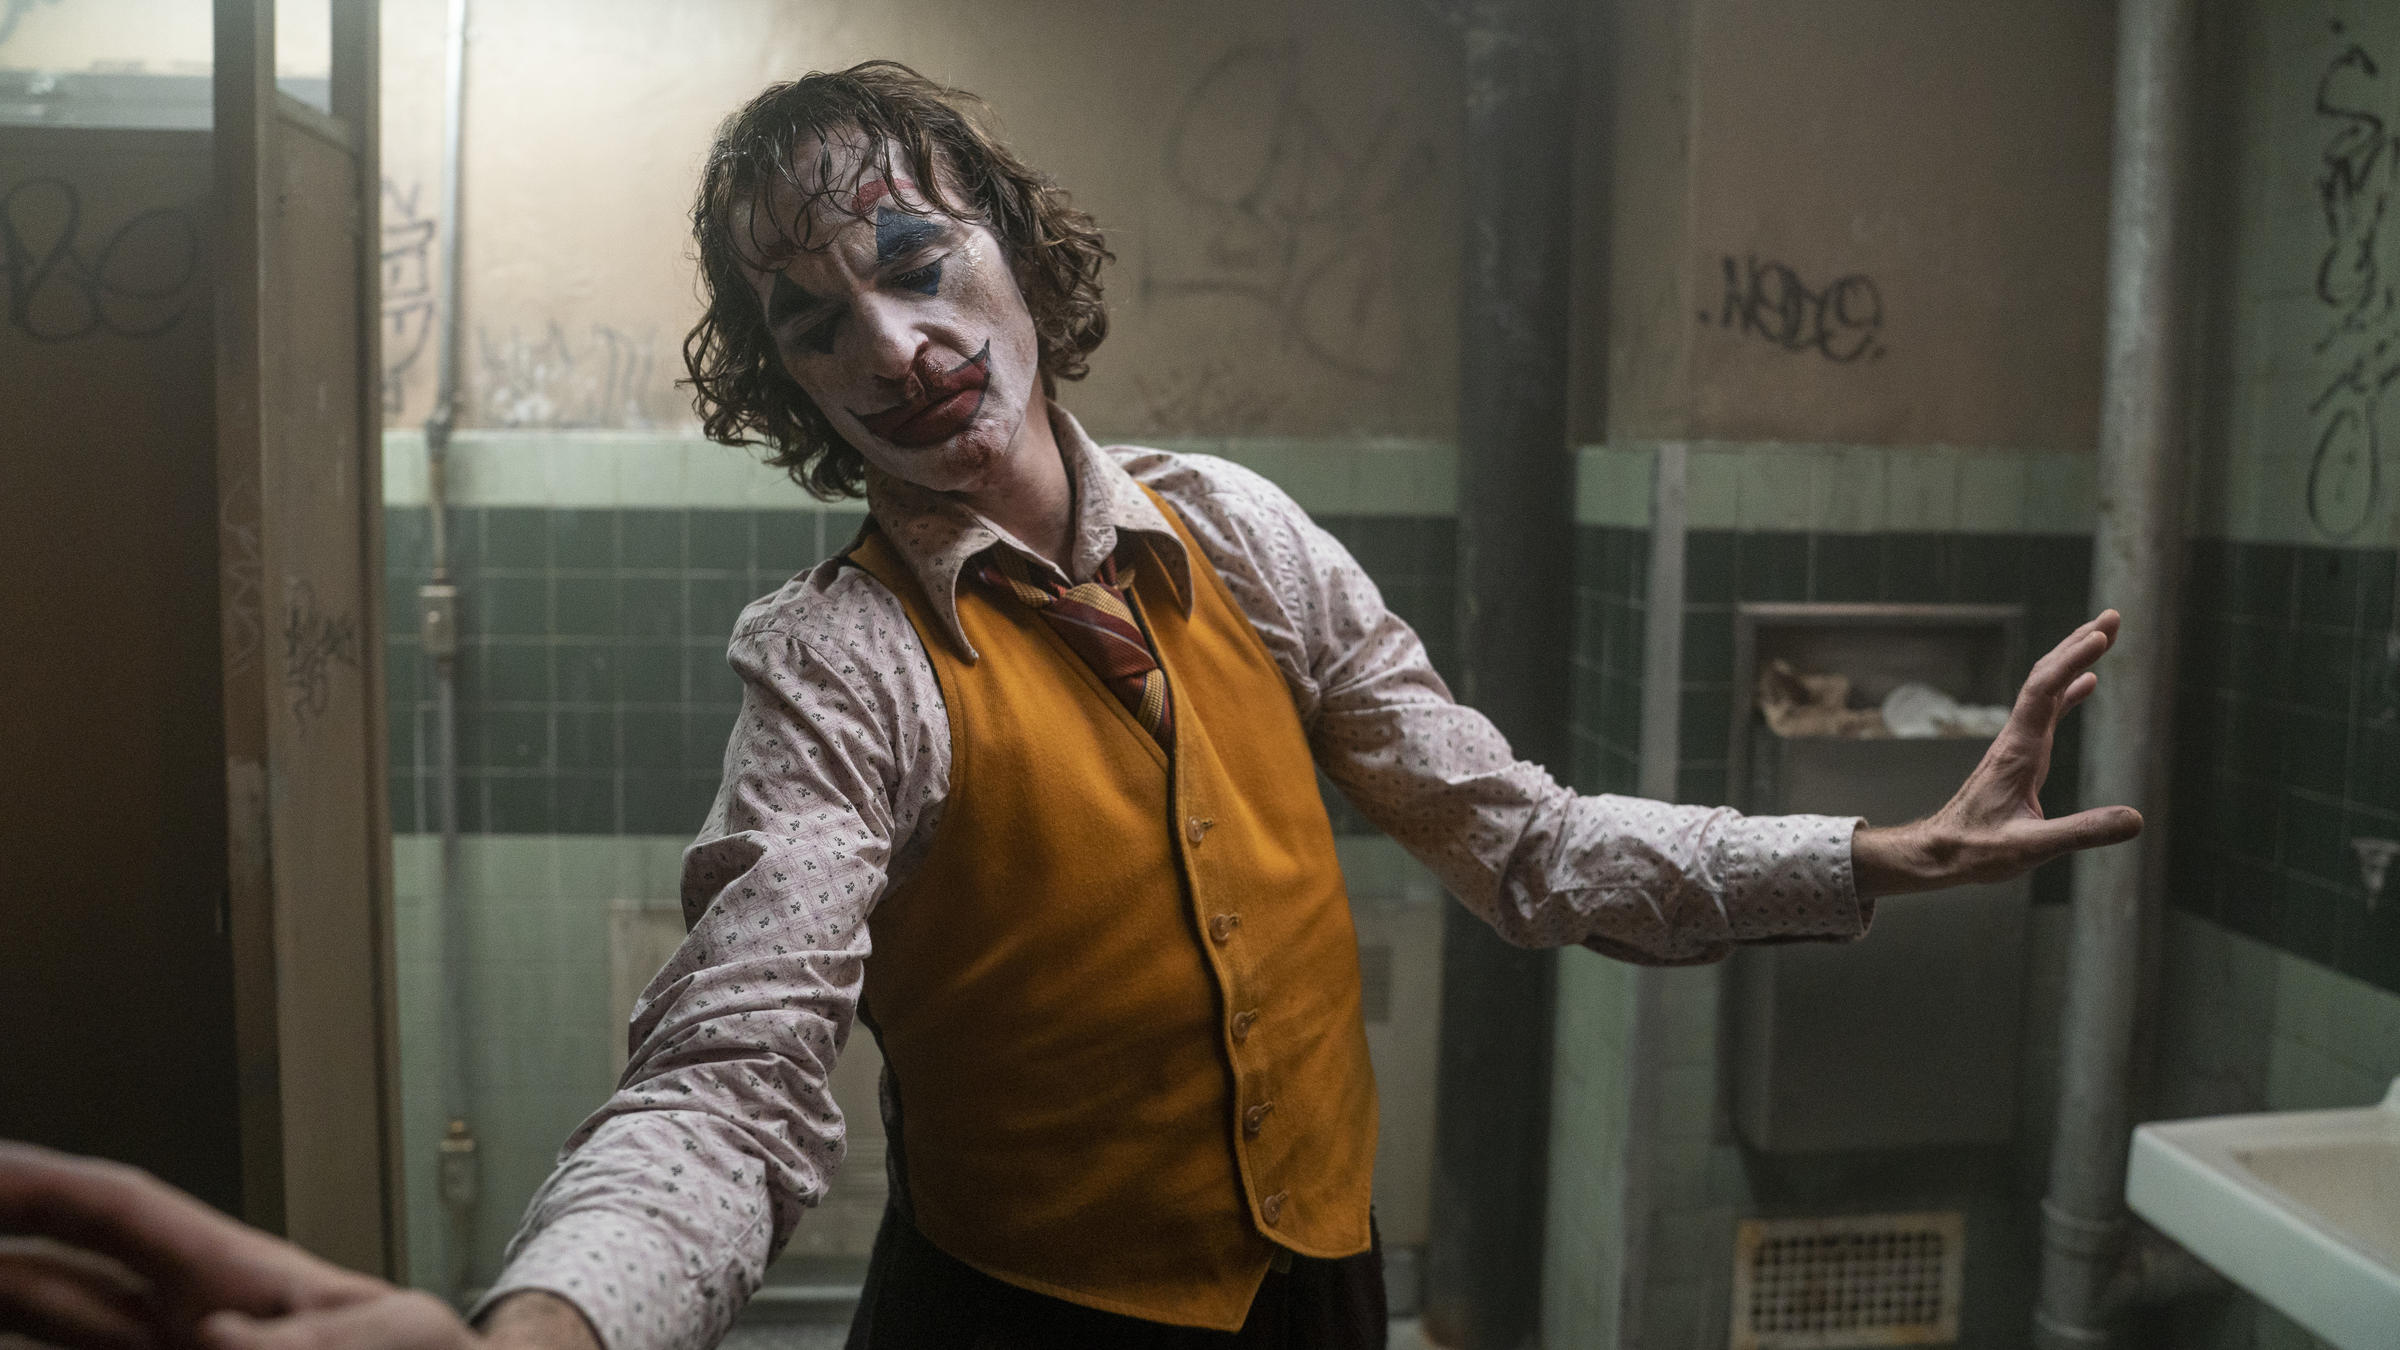 Composer Un Menu De Noel.Composer Hildur Gudnadottir Finds The Humanity In Joker Wvtf